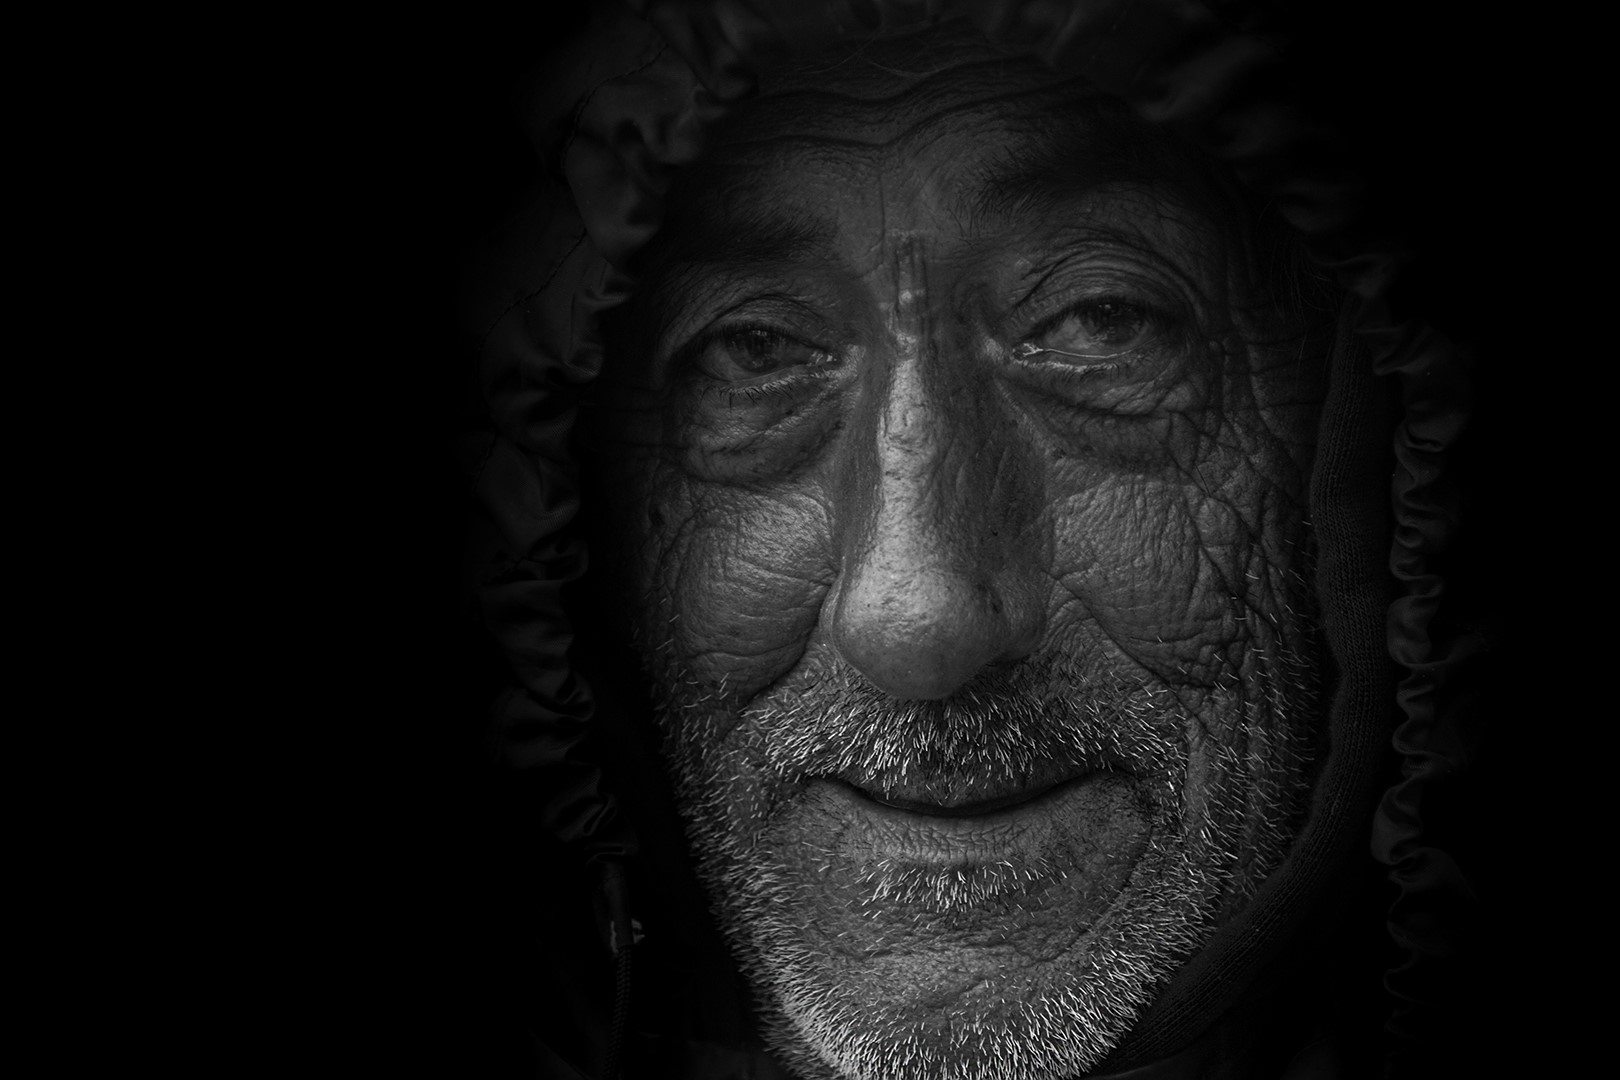 Eifert János: Öreg halász Trapaniból / An old fisherman from Trapani (Szicília, 2018)